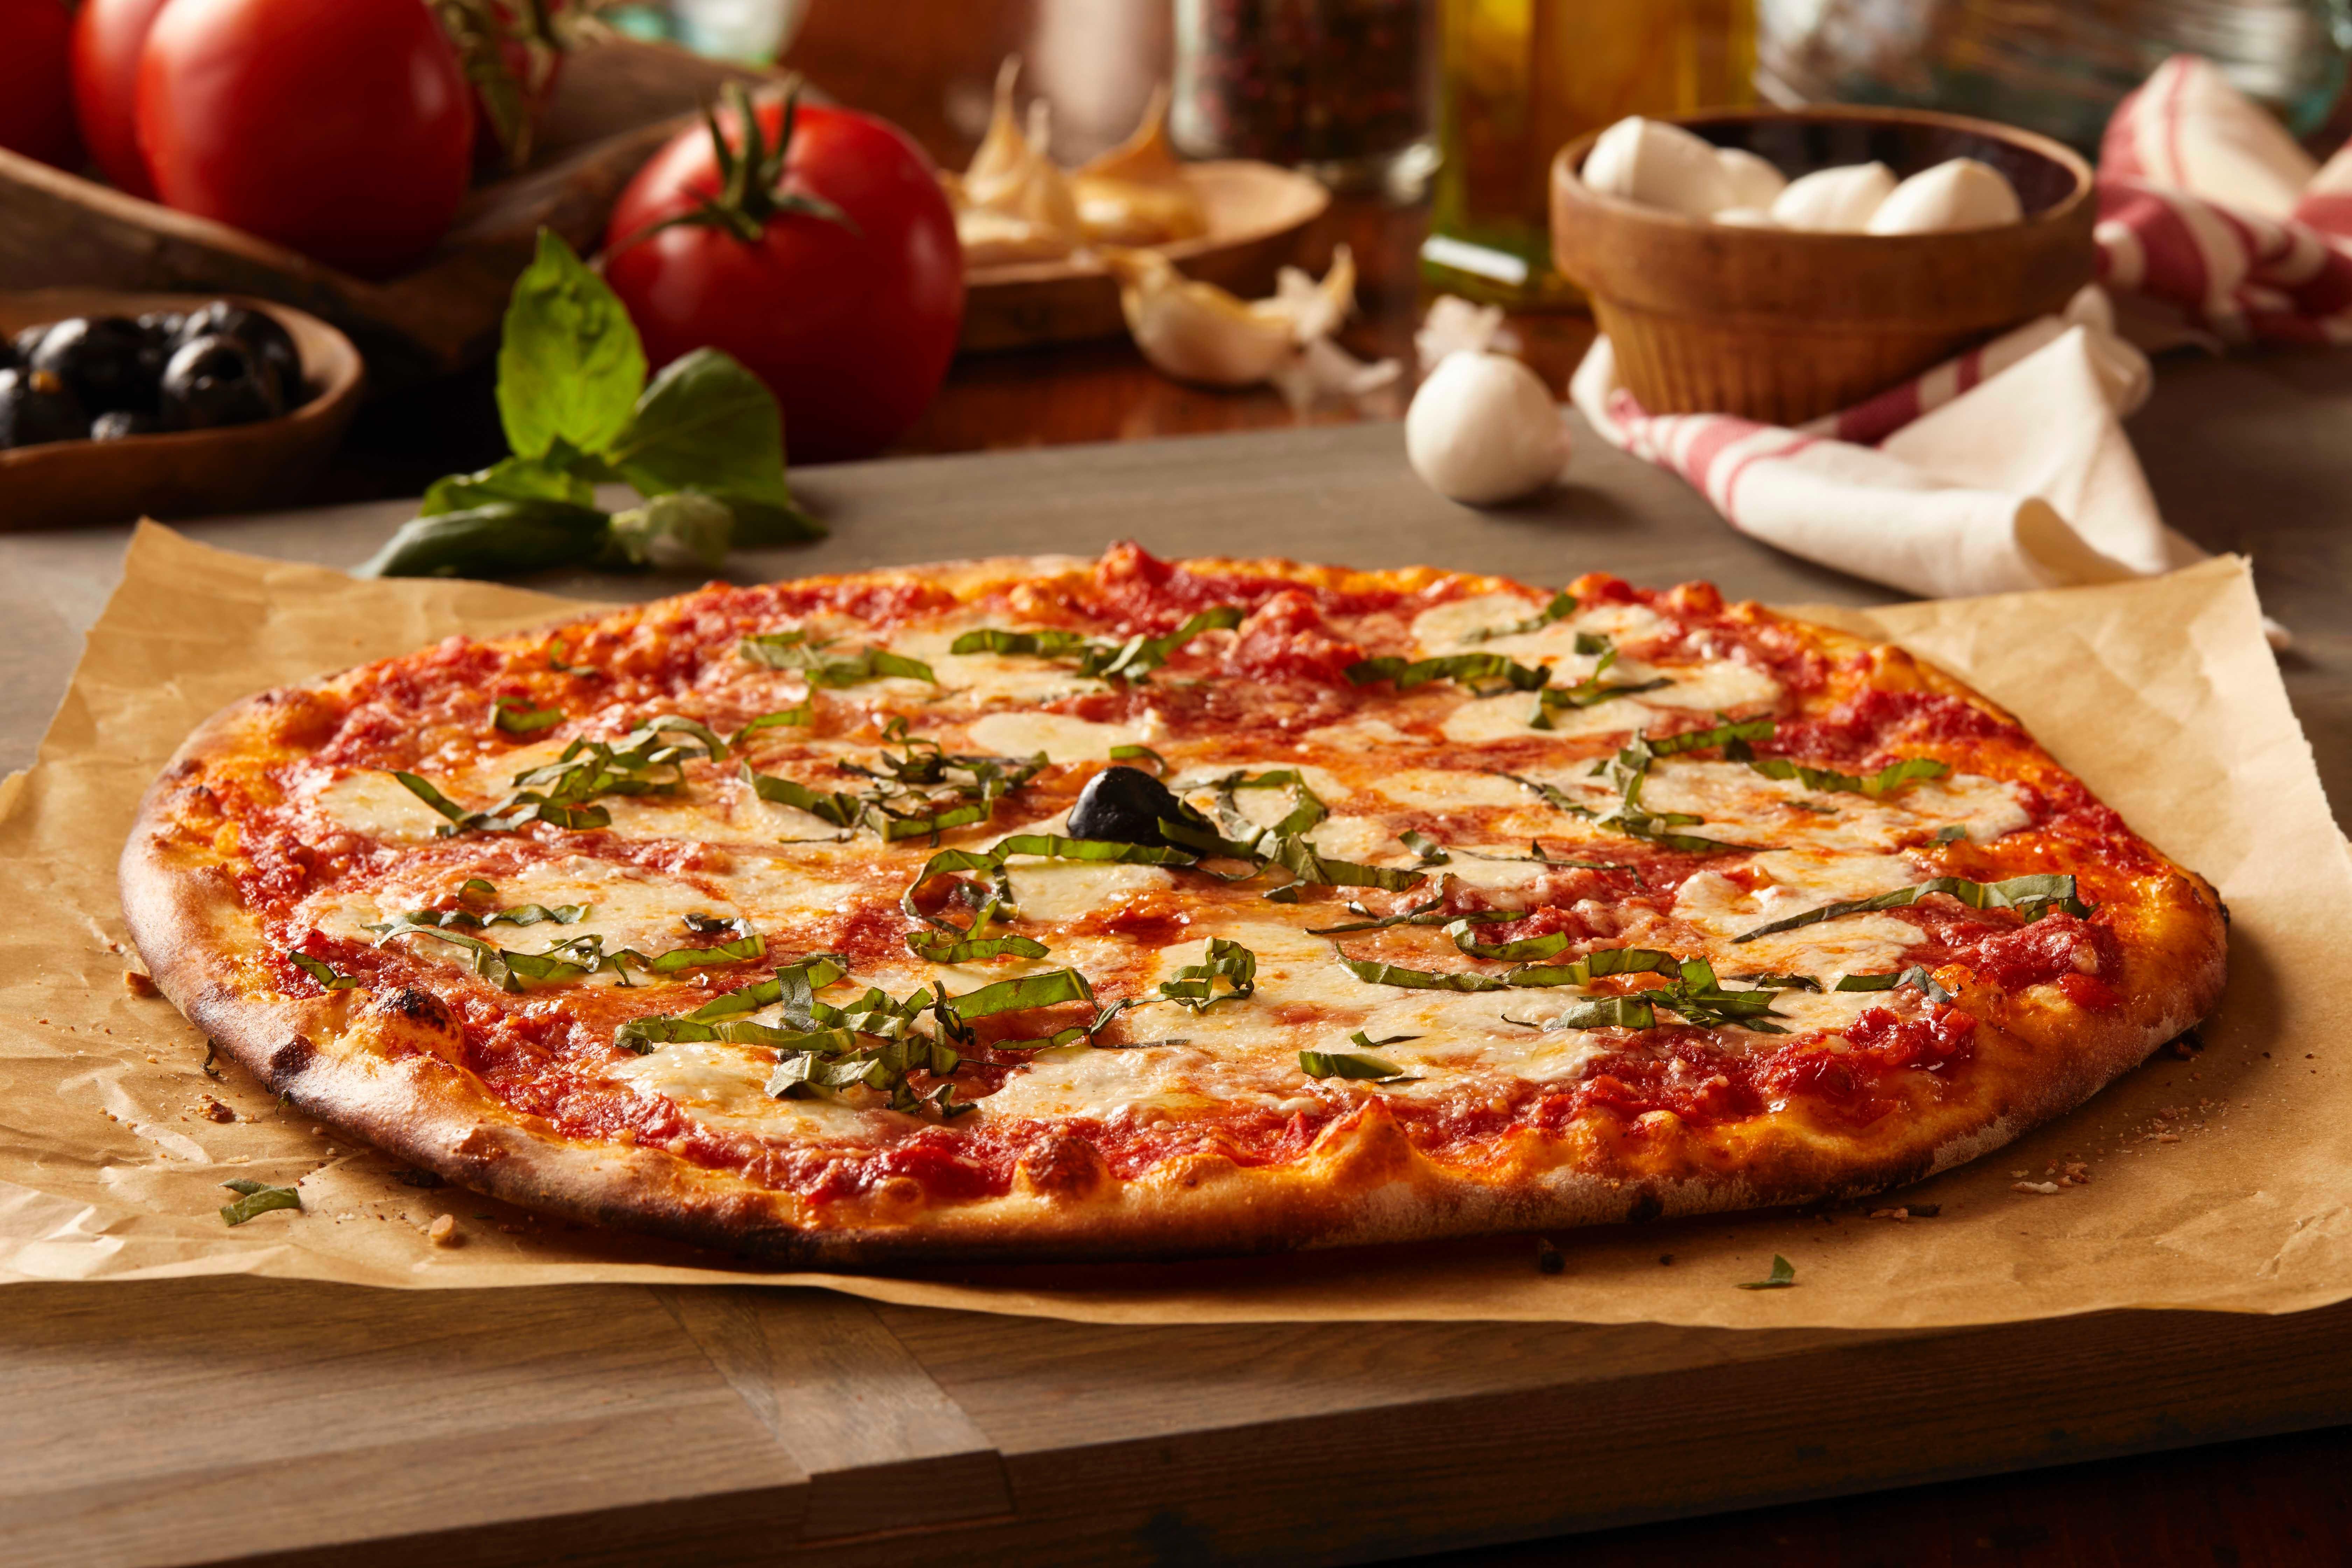 Bertucci's Brick Oven Pizza & Pasta Menu - Medford, MA ...